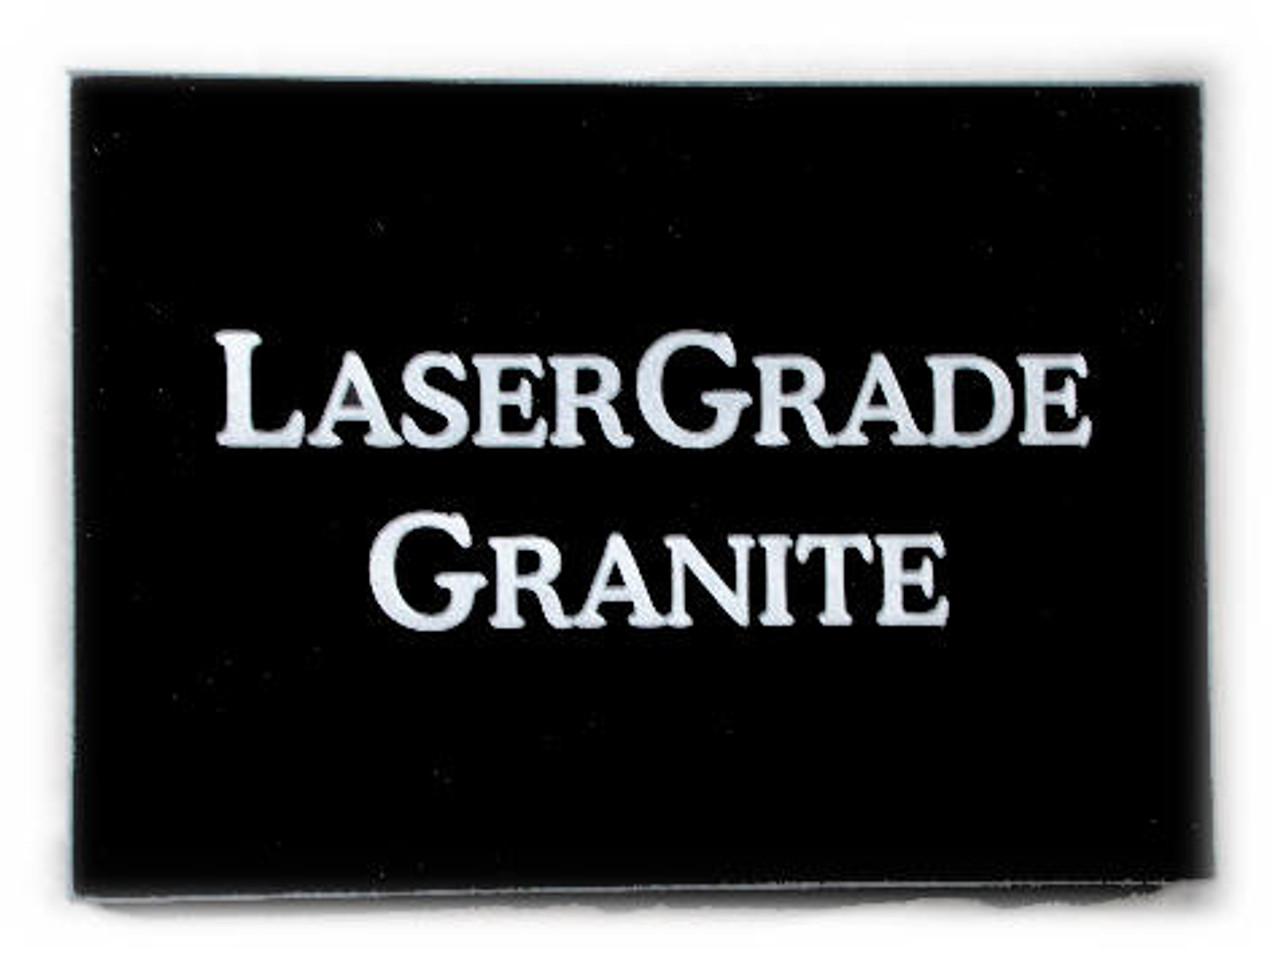 "G-MB-24 x 36 EP,  LaserGrade, MB Black Granite, 24"" x 36"" x 3/4"",  Edges Polished,  (5 face polished)"